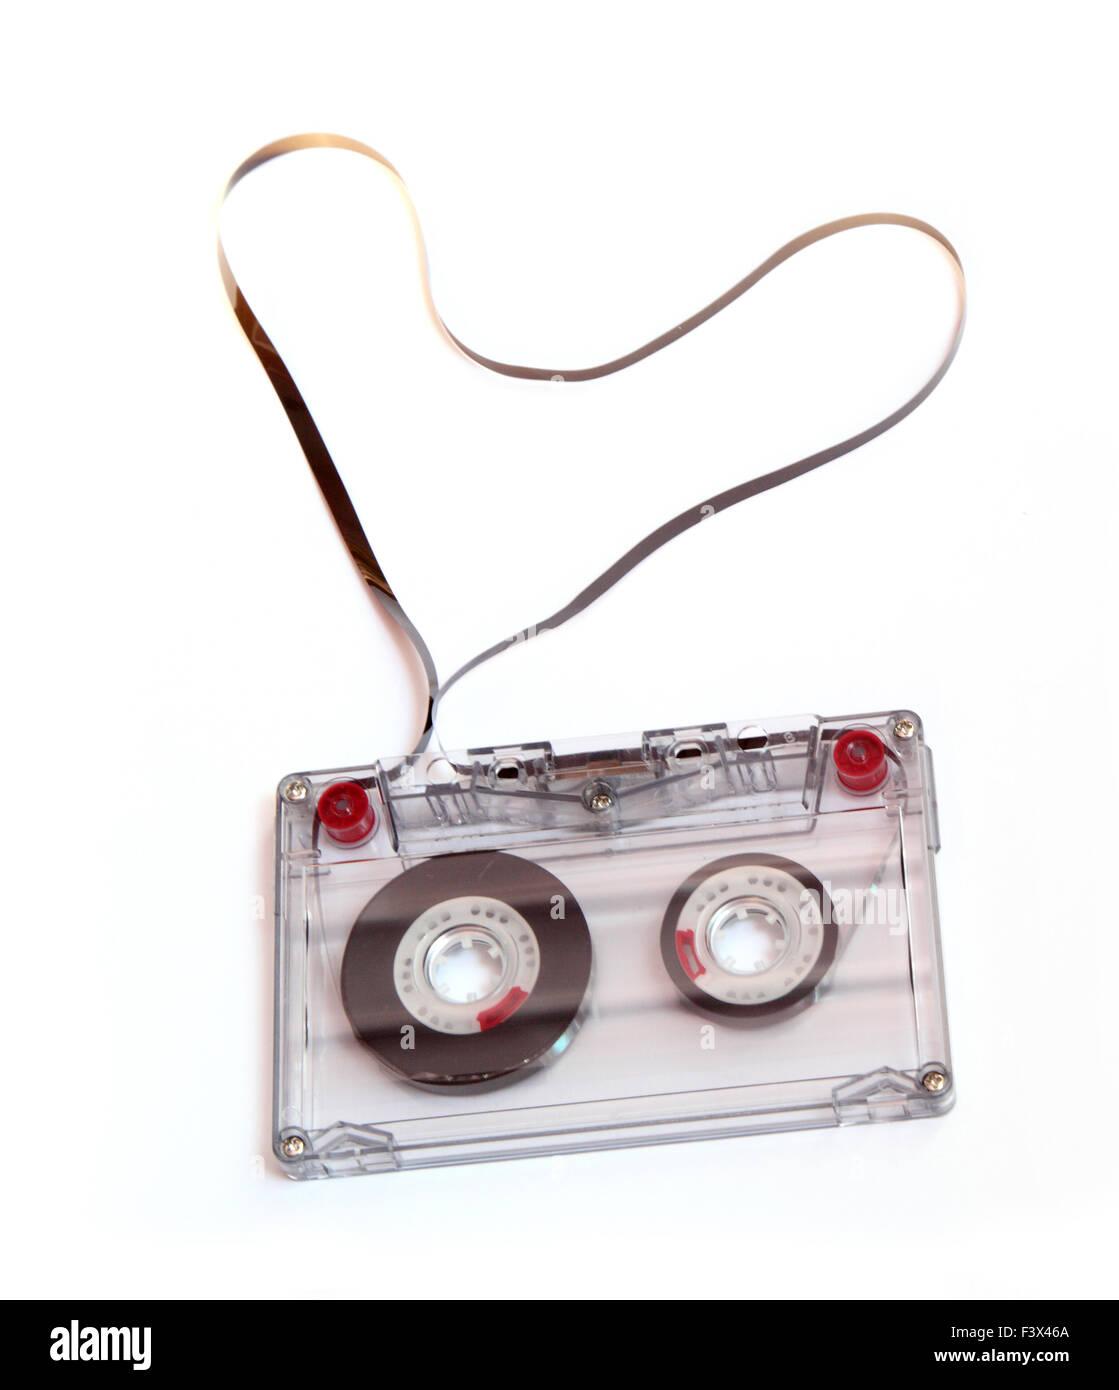 audiocassette - Stock Image